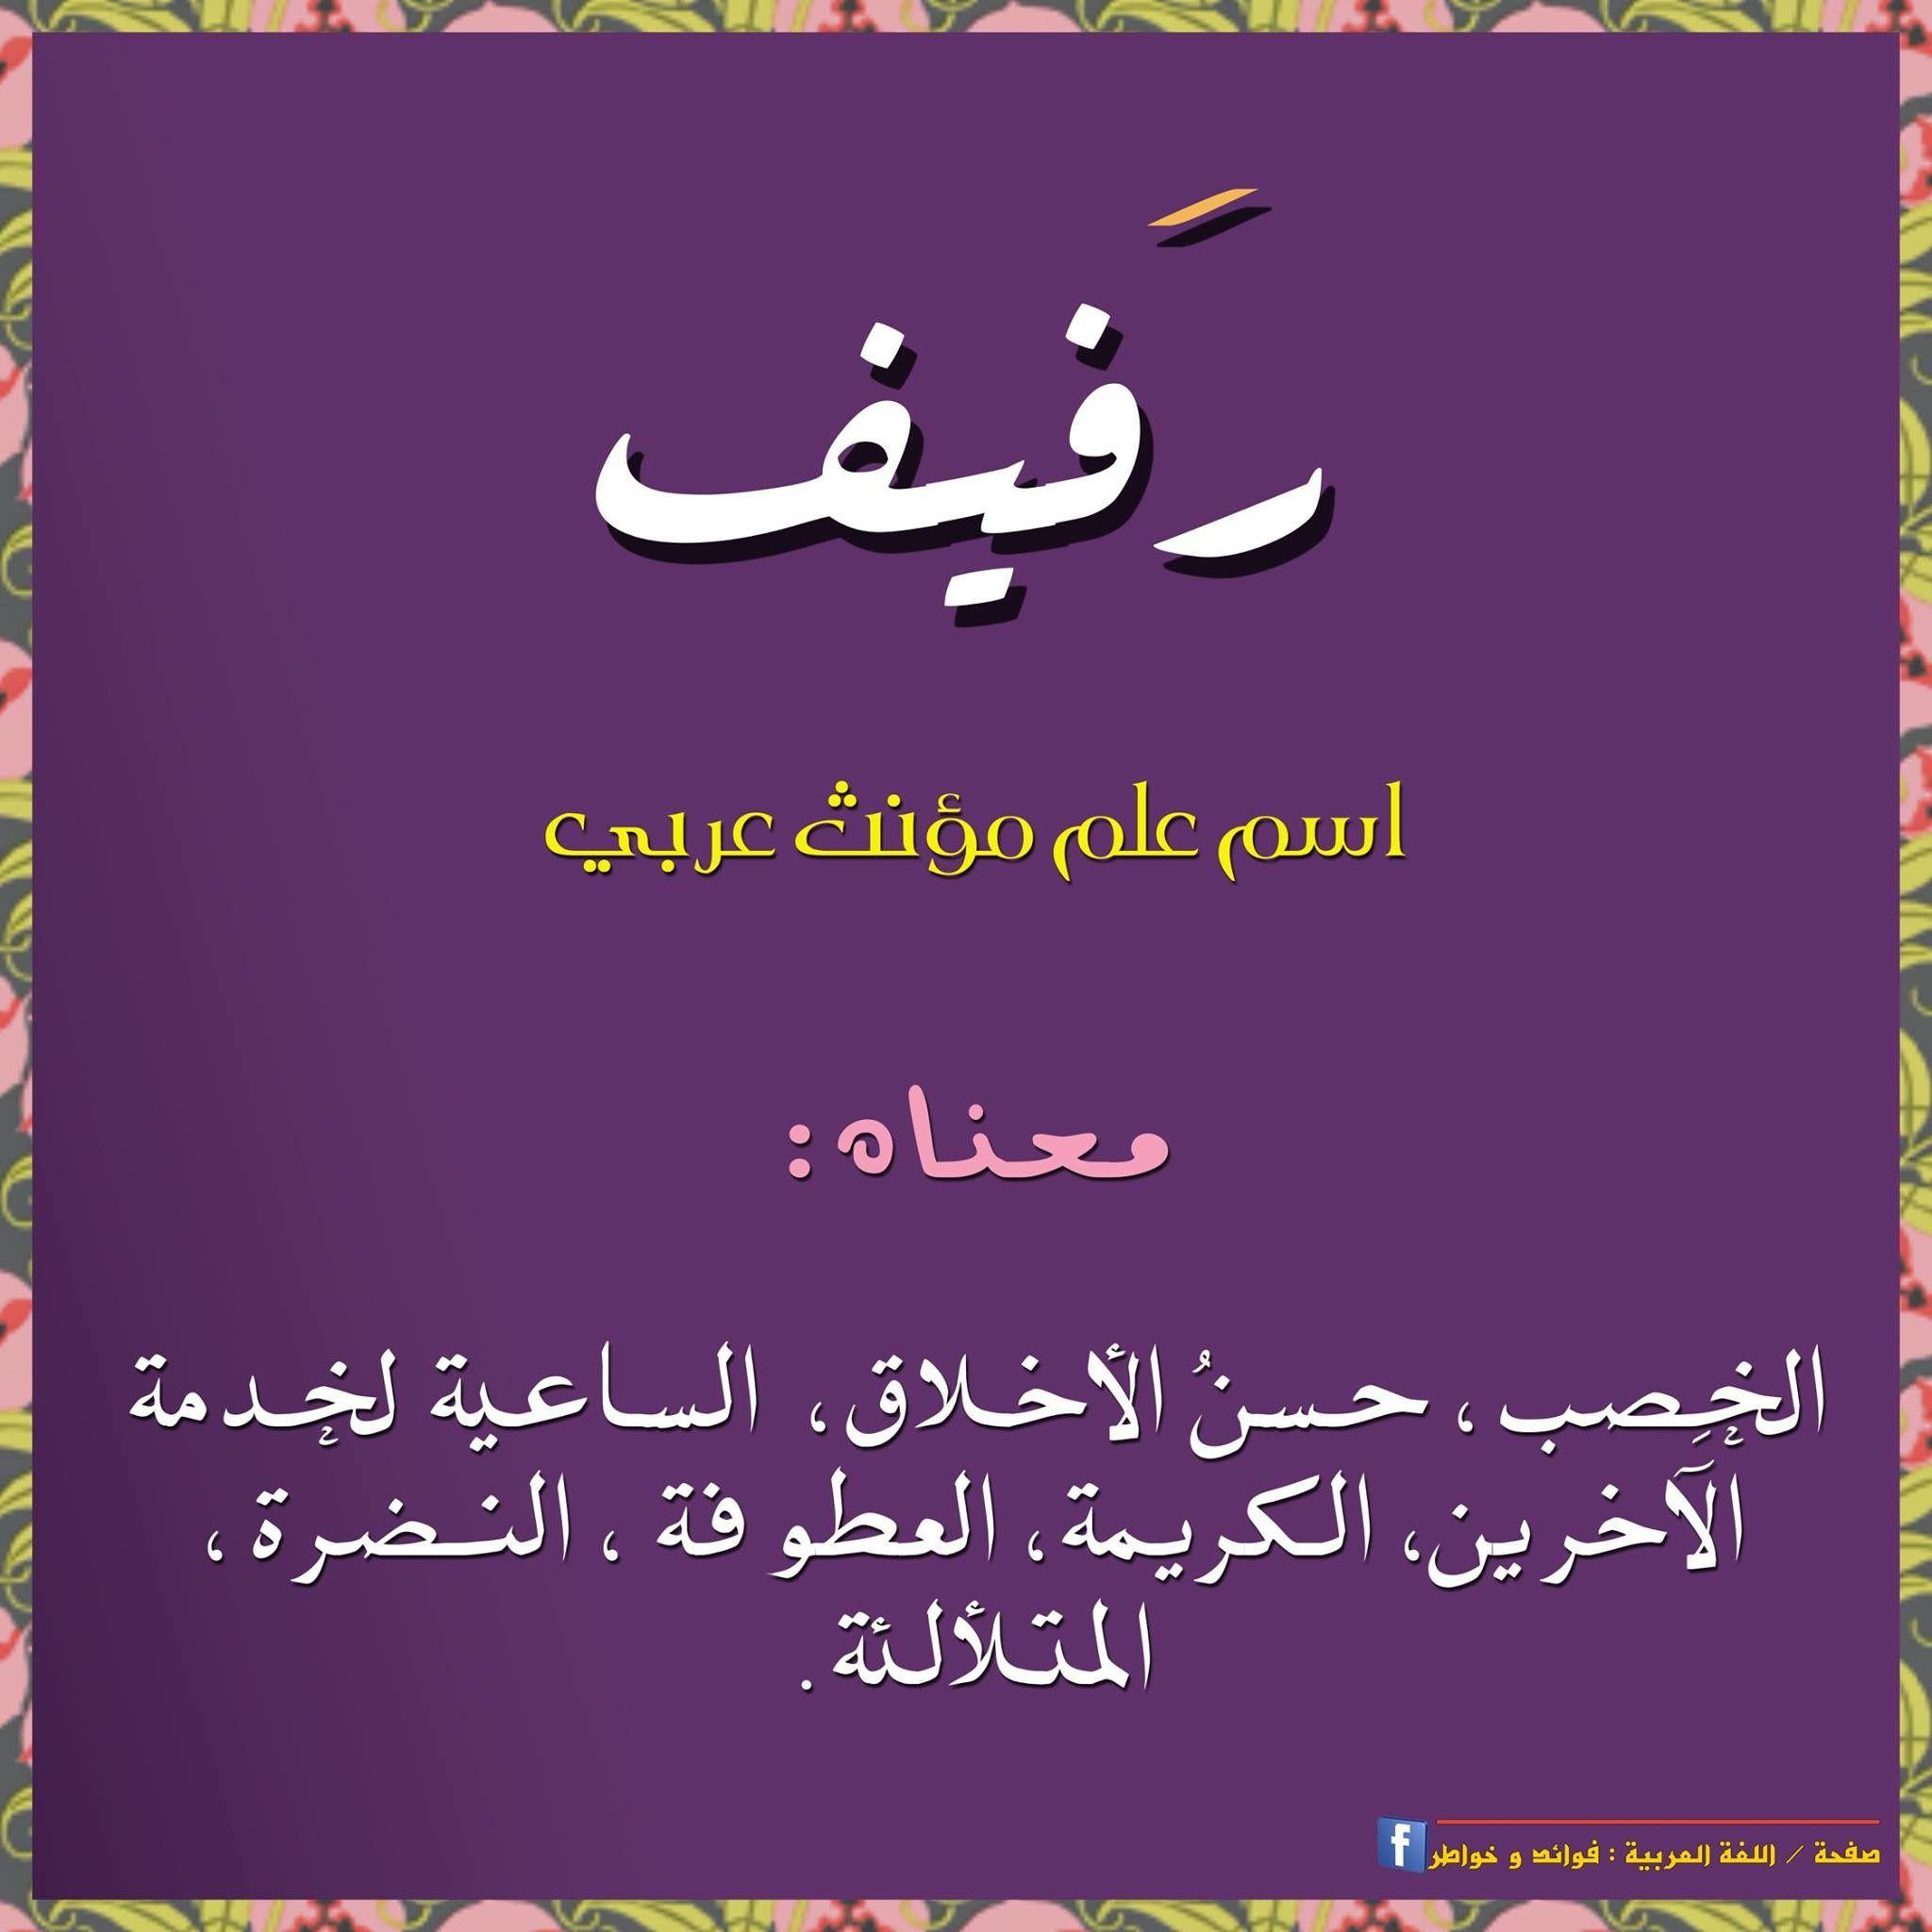 Pin By Sereen Fayad On منوعة عربية Learn Arabic Language Learning Arabic Arabic Words